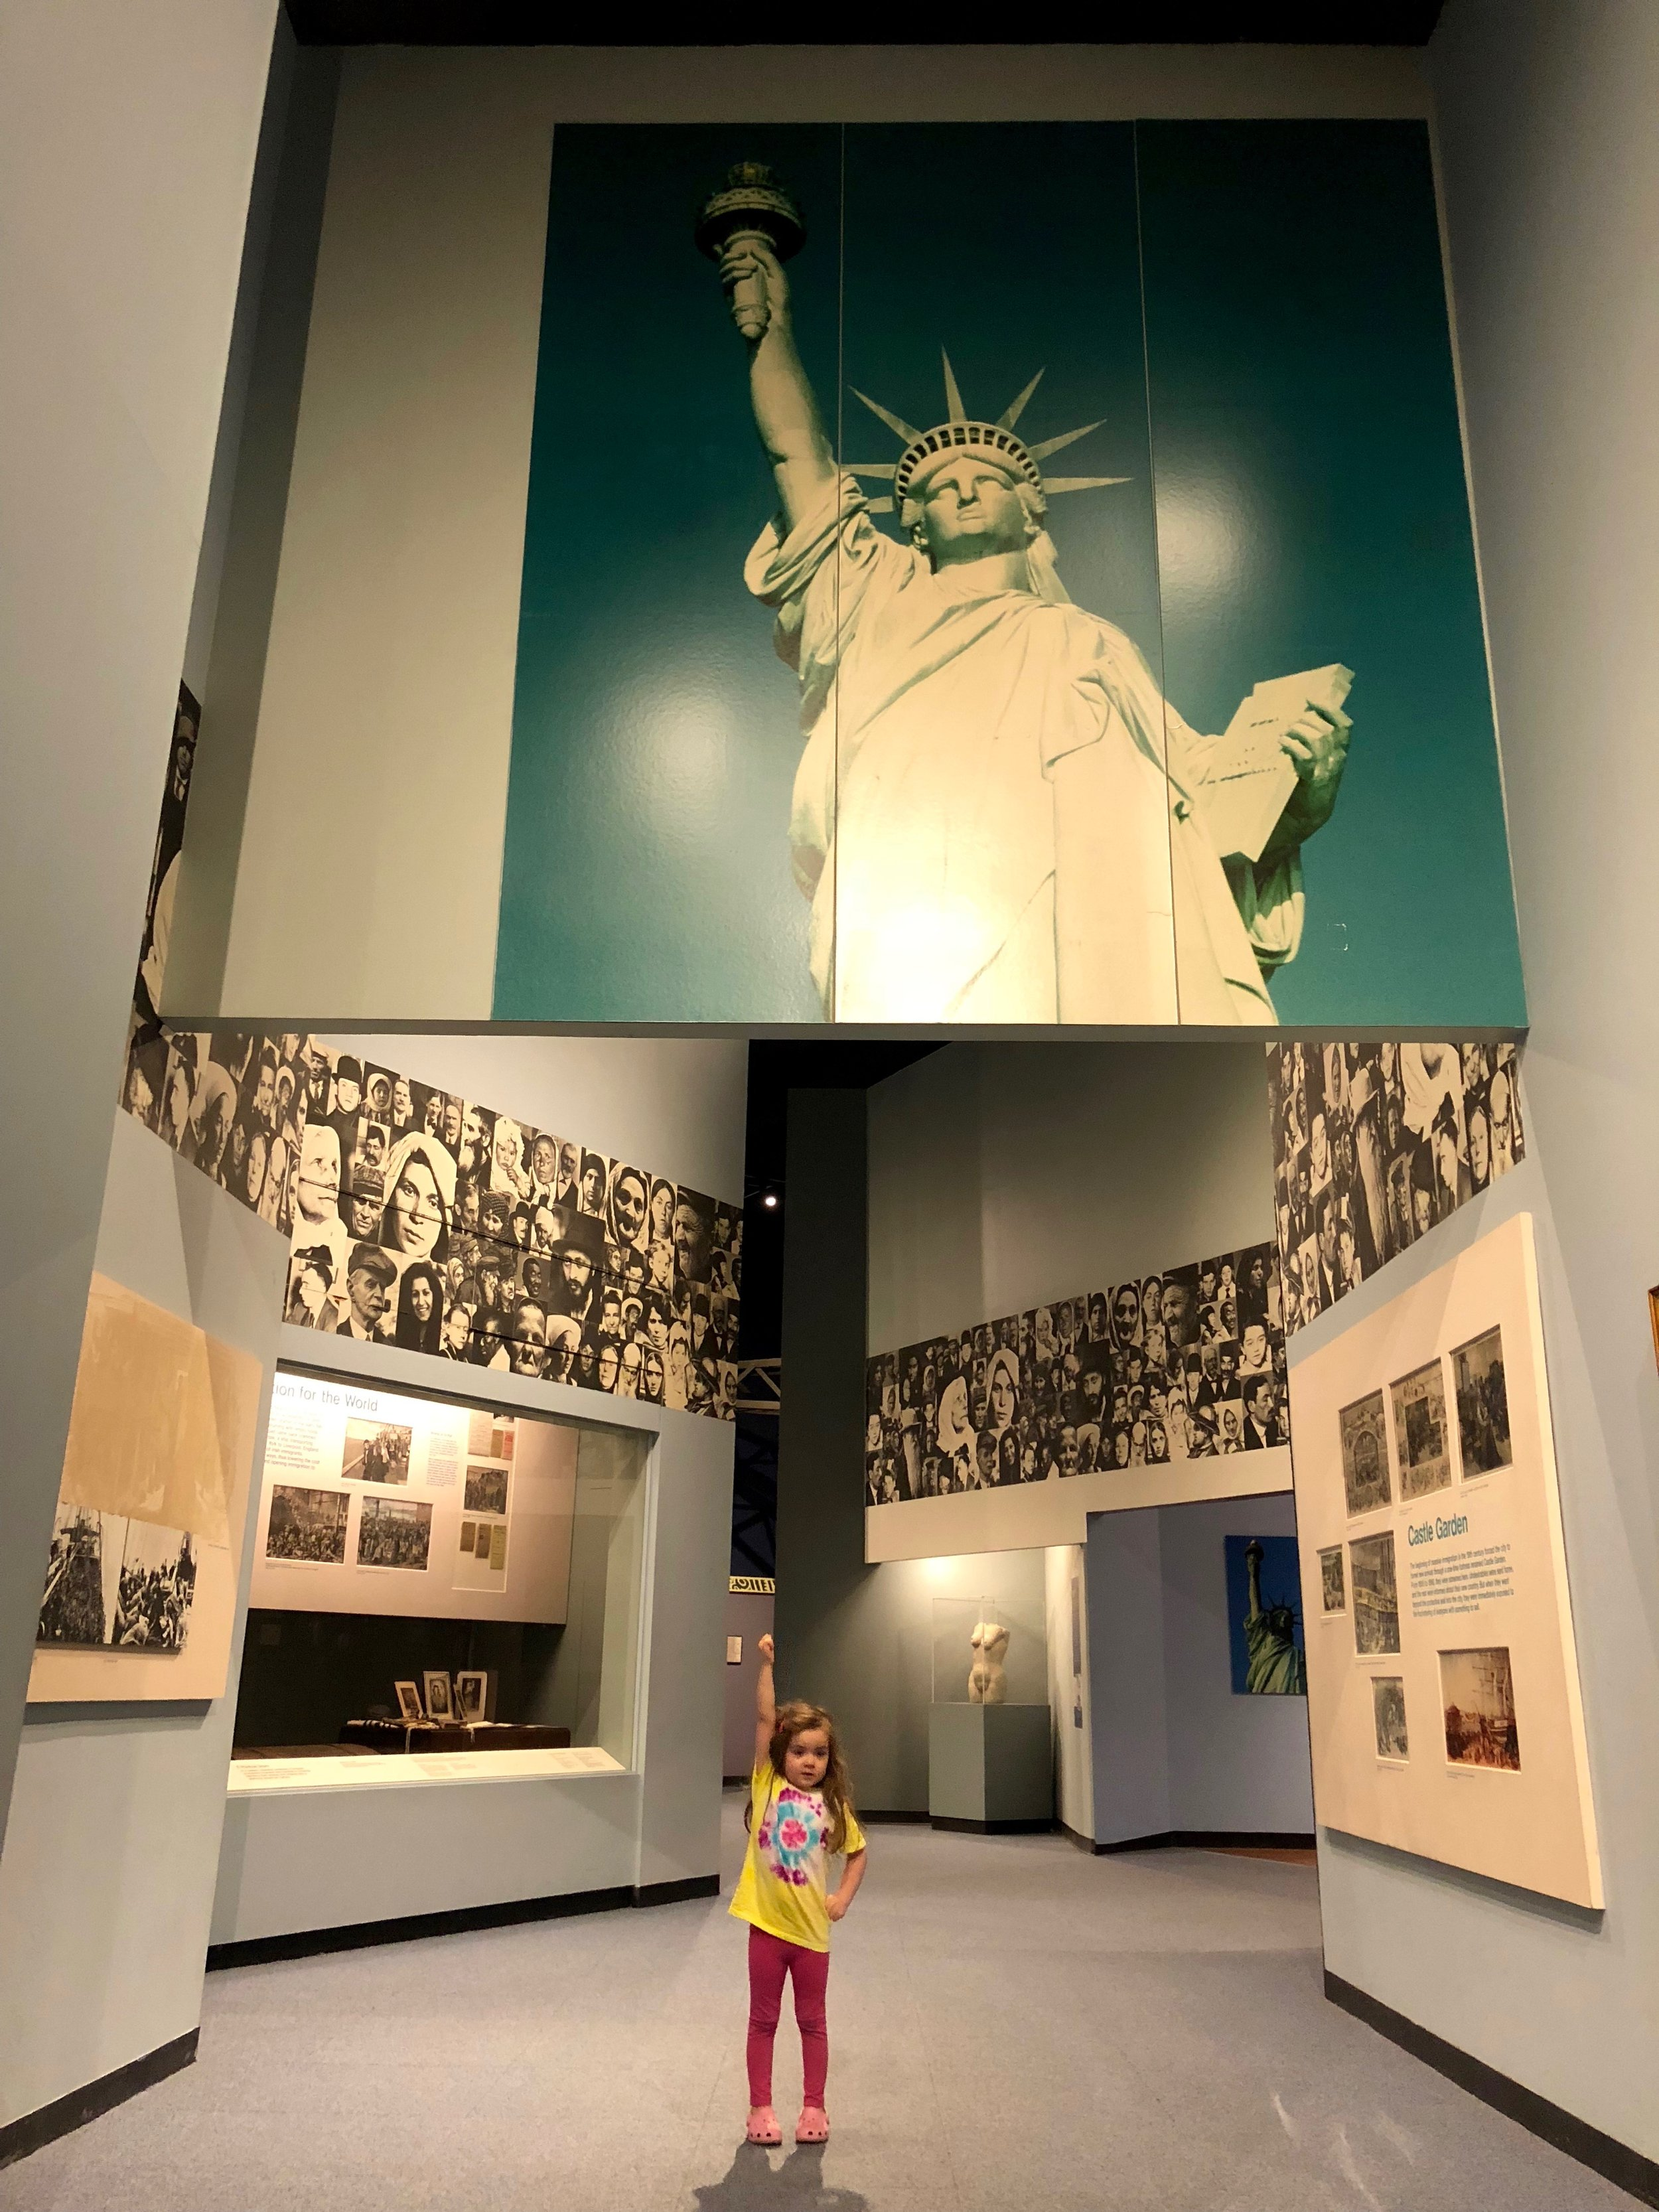 Ellis Island exhibit at the New York State Museum